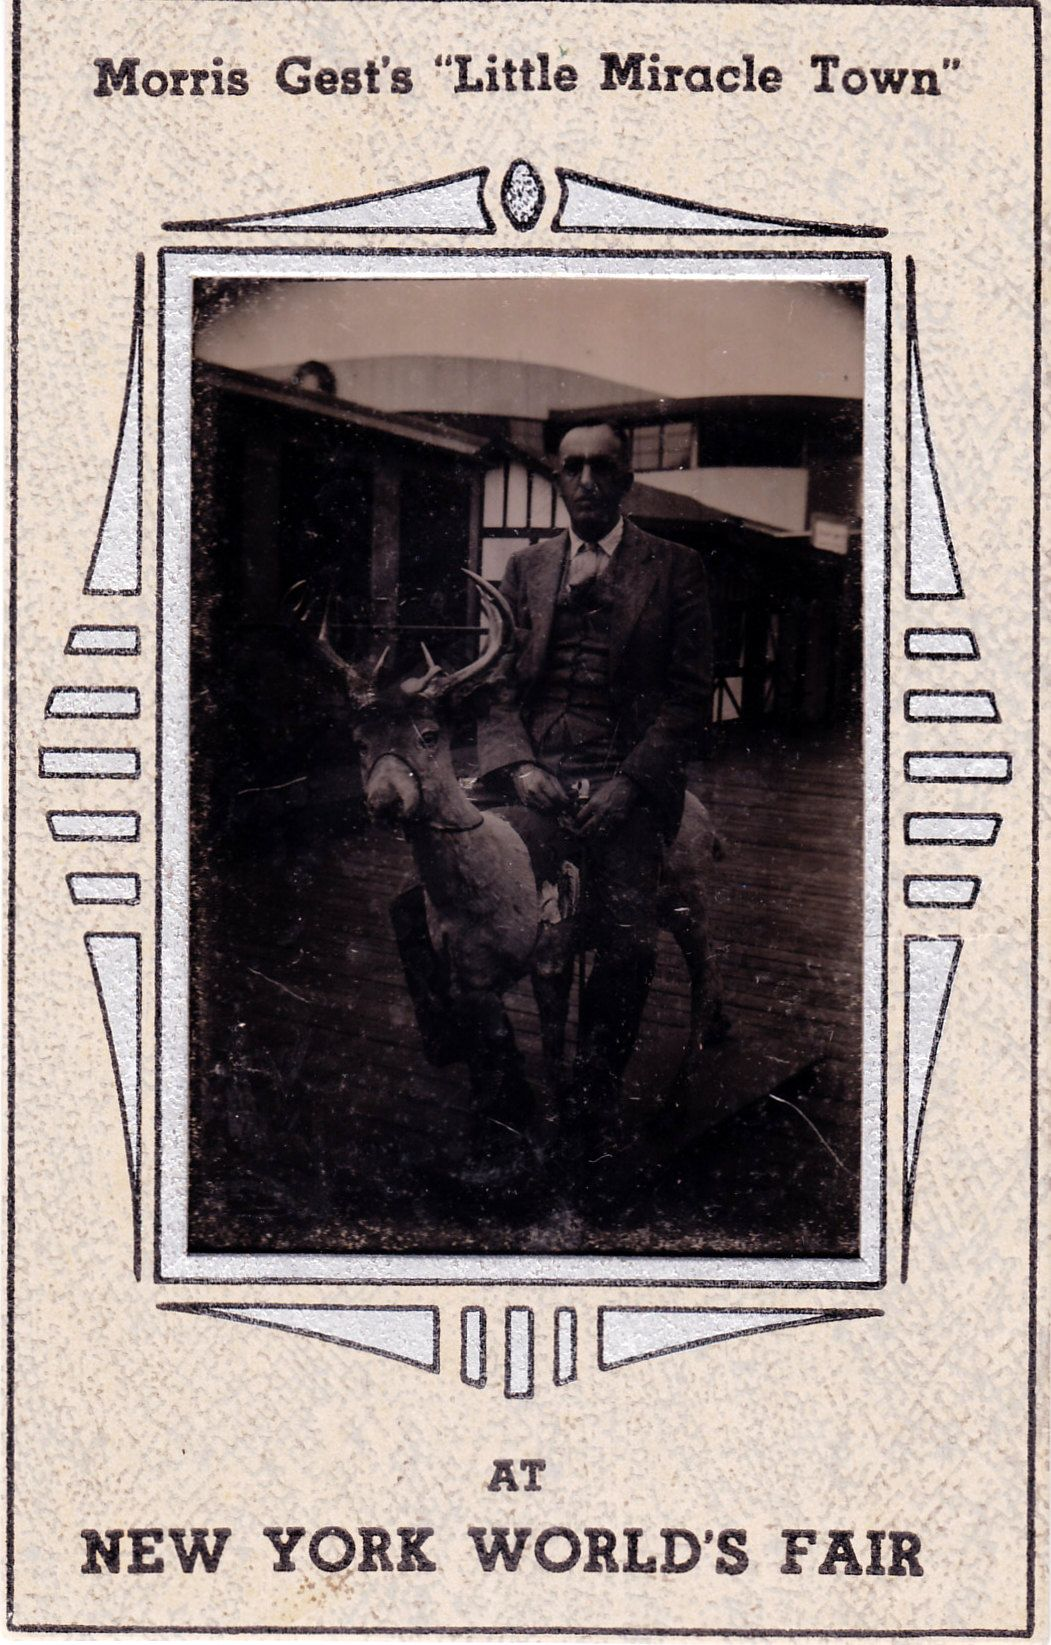 New York World's Fair 1939, Little Miracle Town